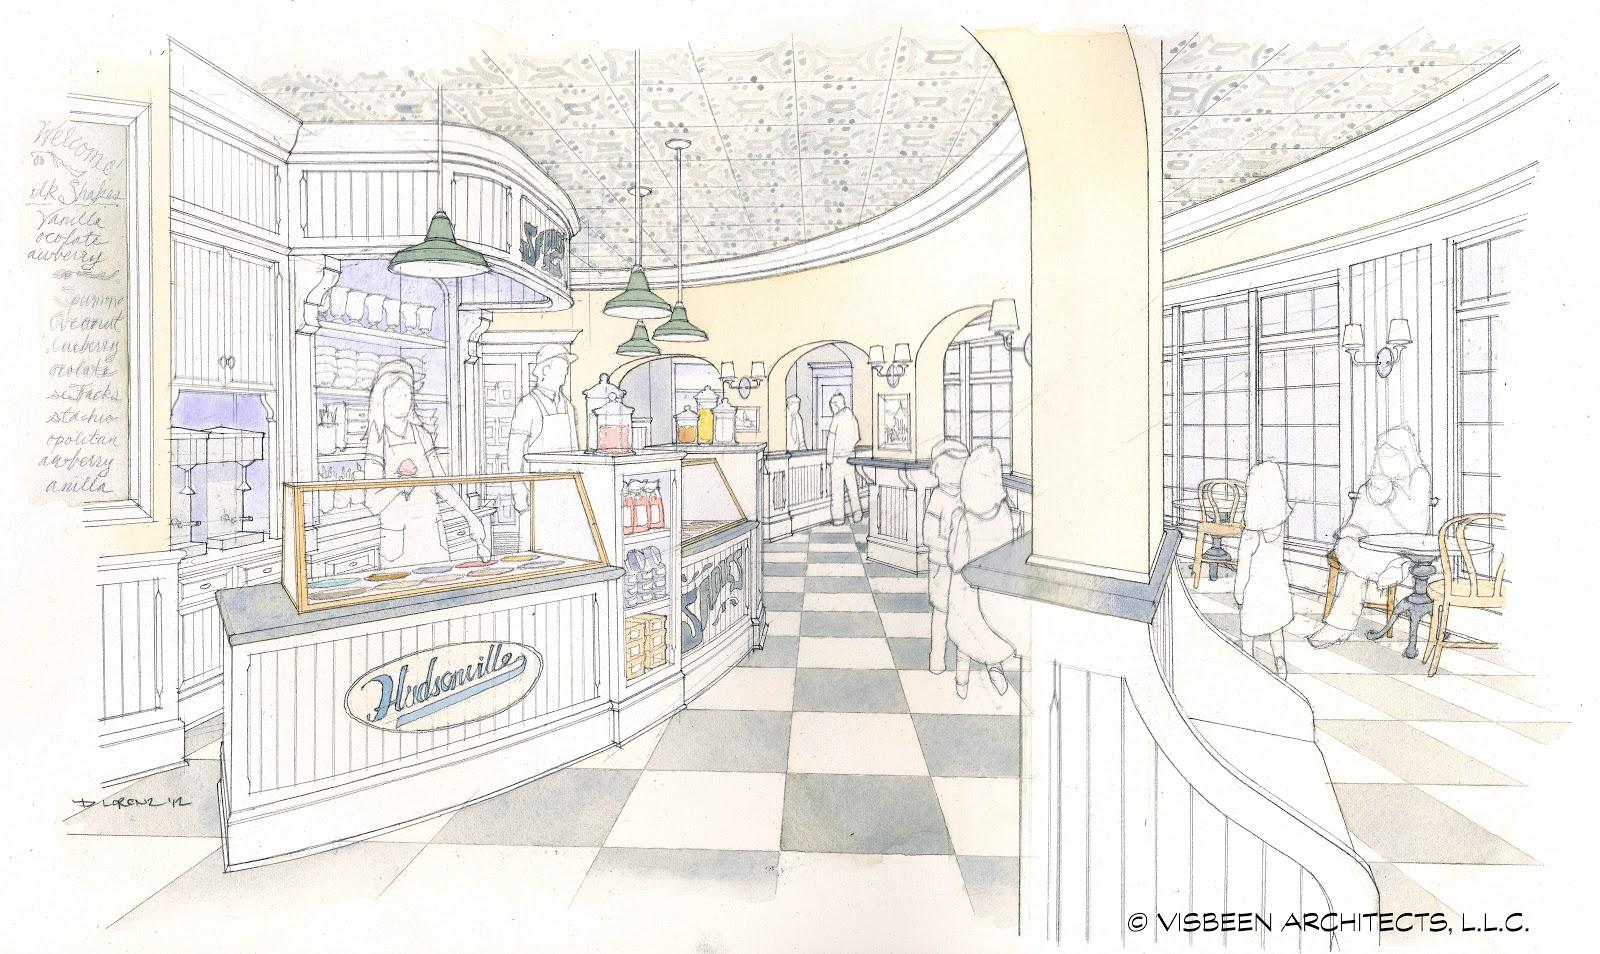 1600x954 Sadie's Ice Cream Parlor